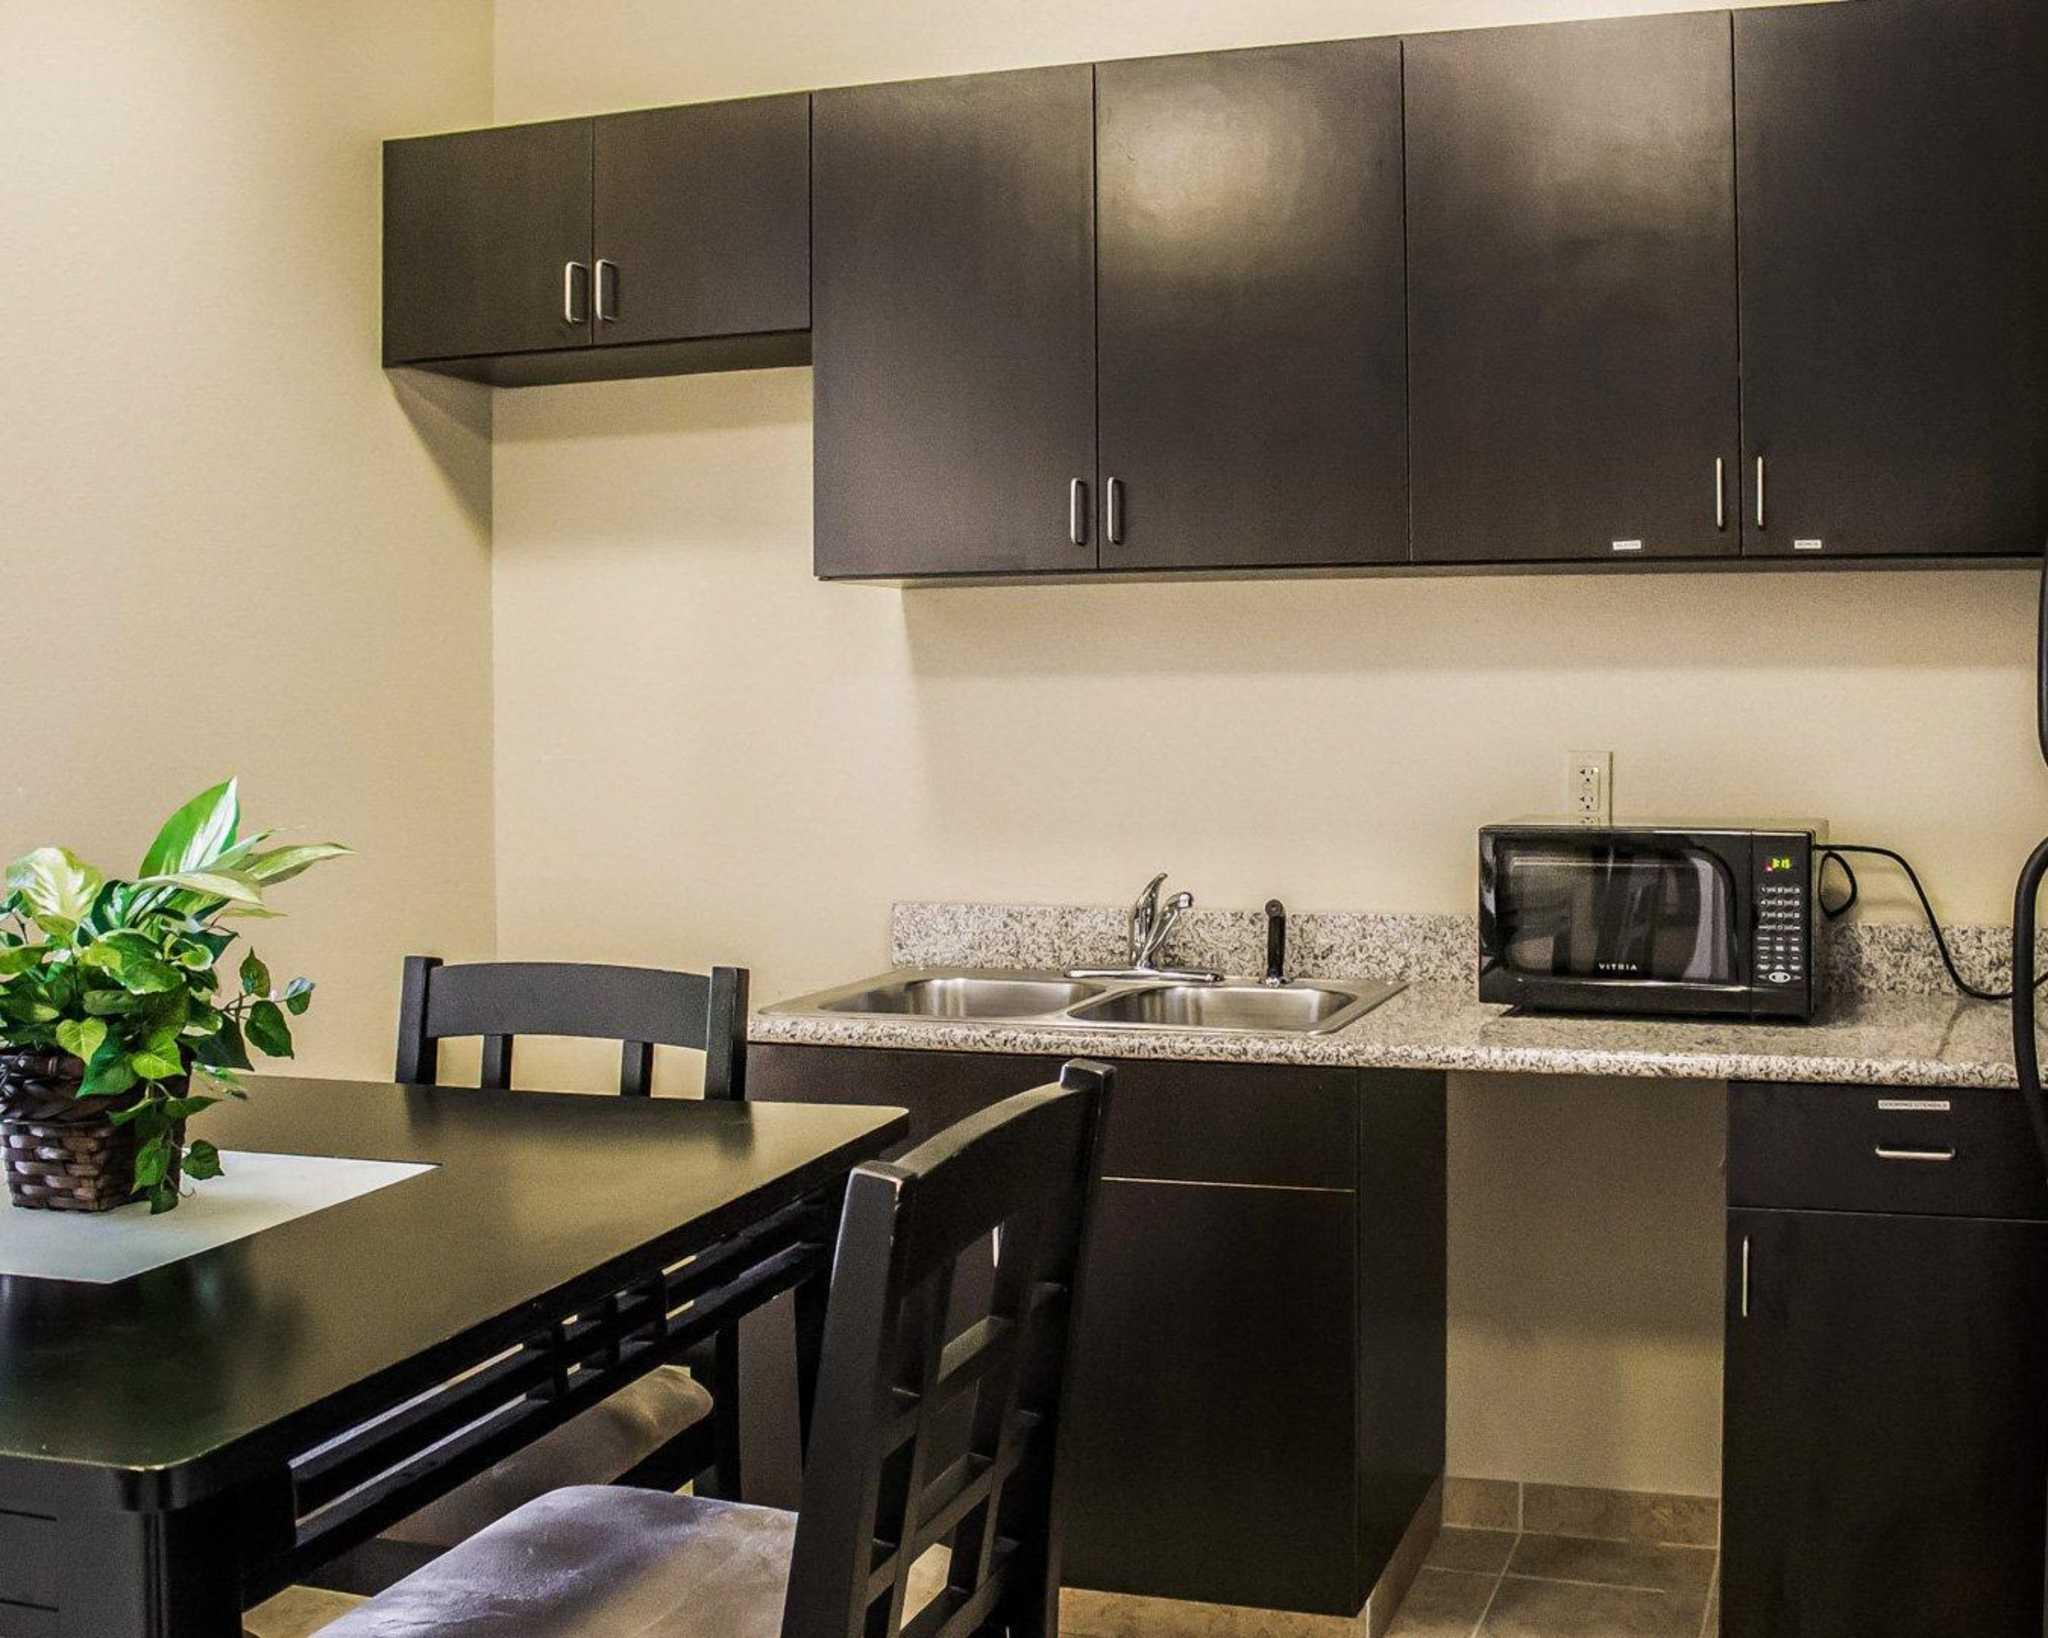 Comfort Suites East Broad at 270 image 20